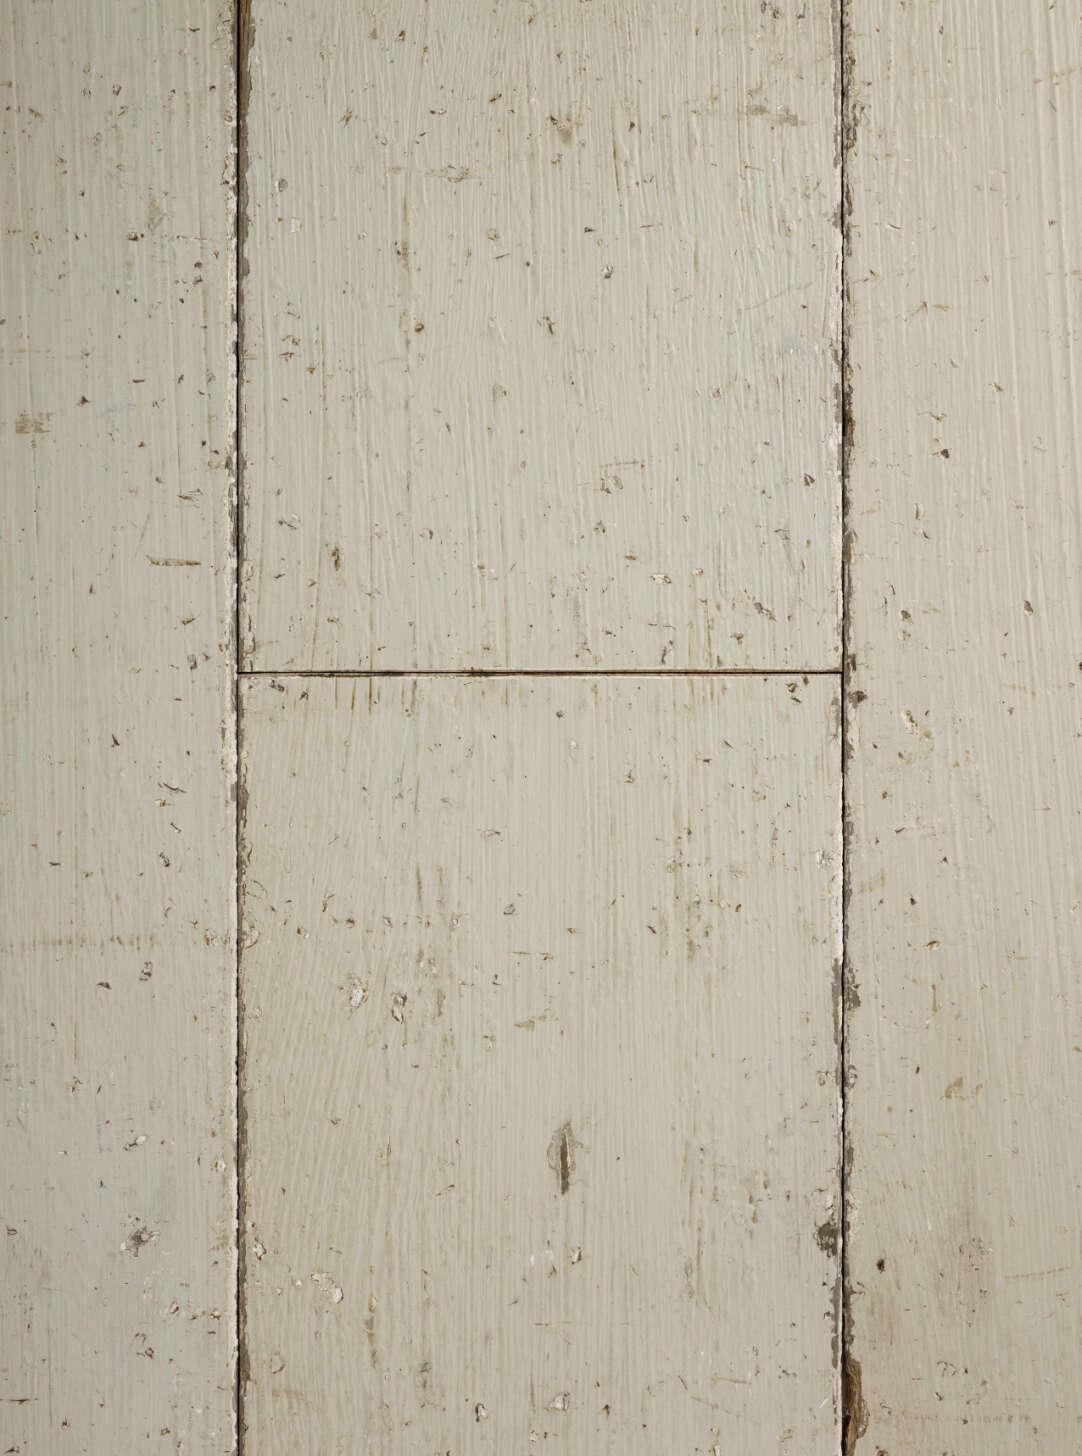 Oak shabby chic old white plank